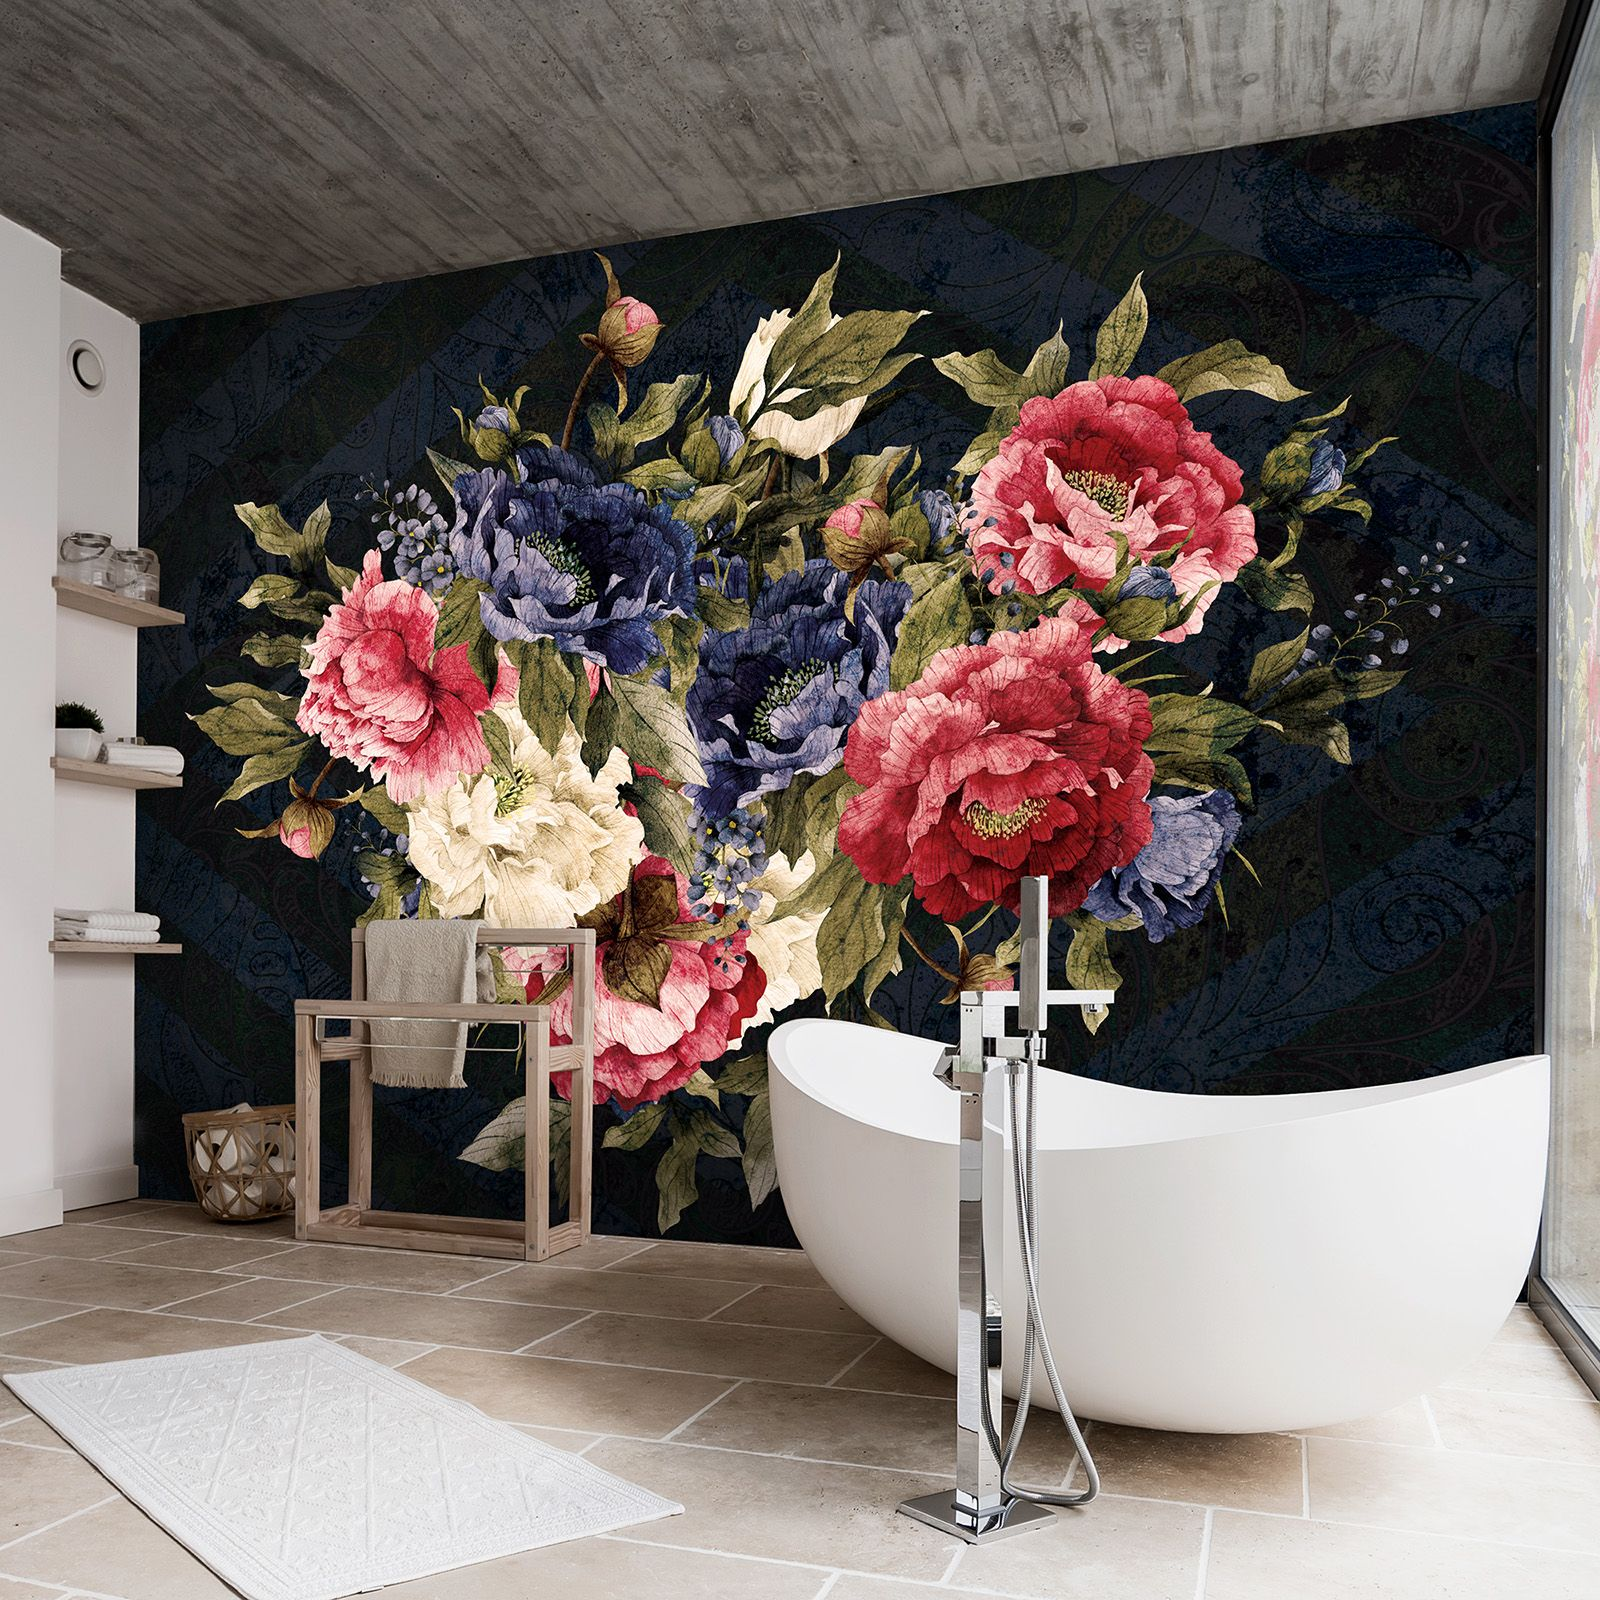 Forwall Fototapete Vlies Tapete Wanddeko Blumen Vintage